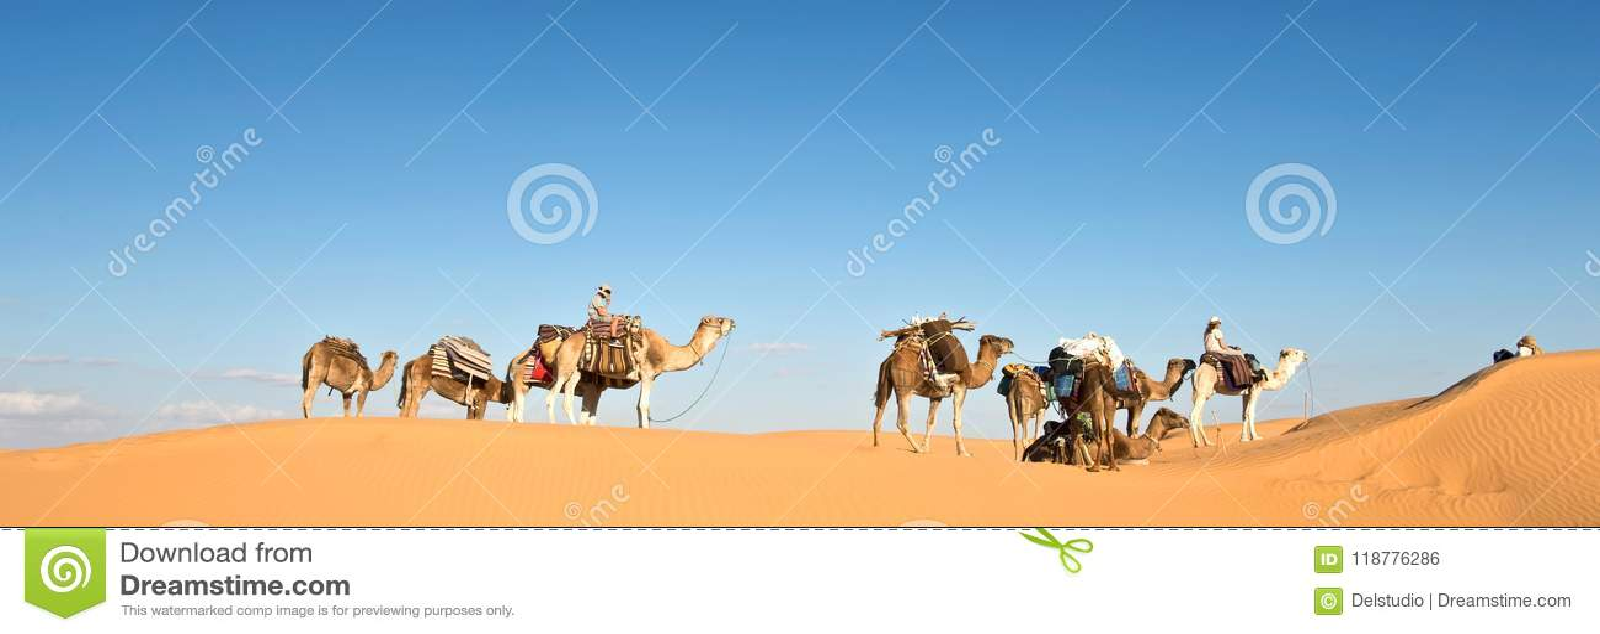 Caravan of camels in the Sand dunes desert of Sahara, South Tunisia